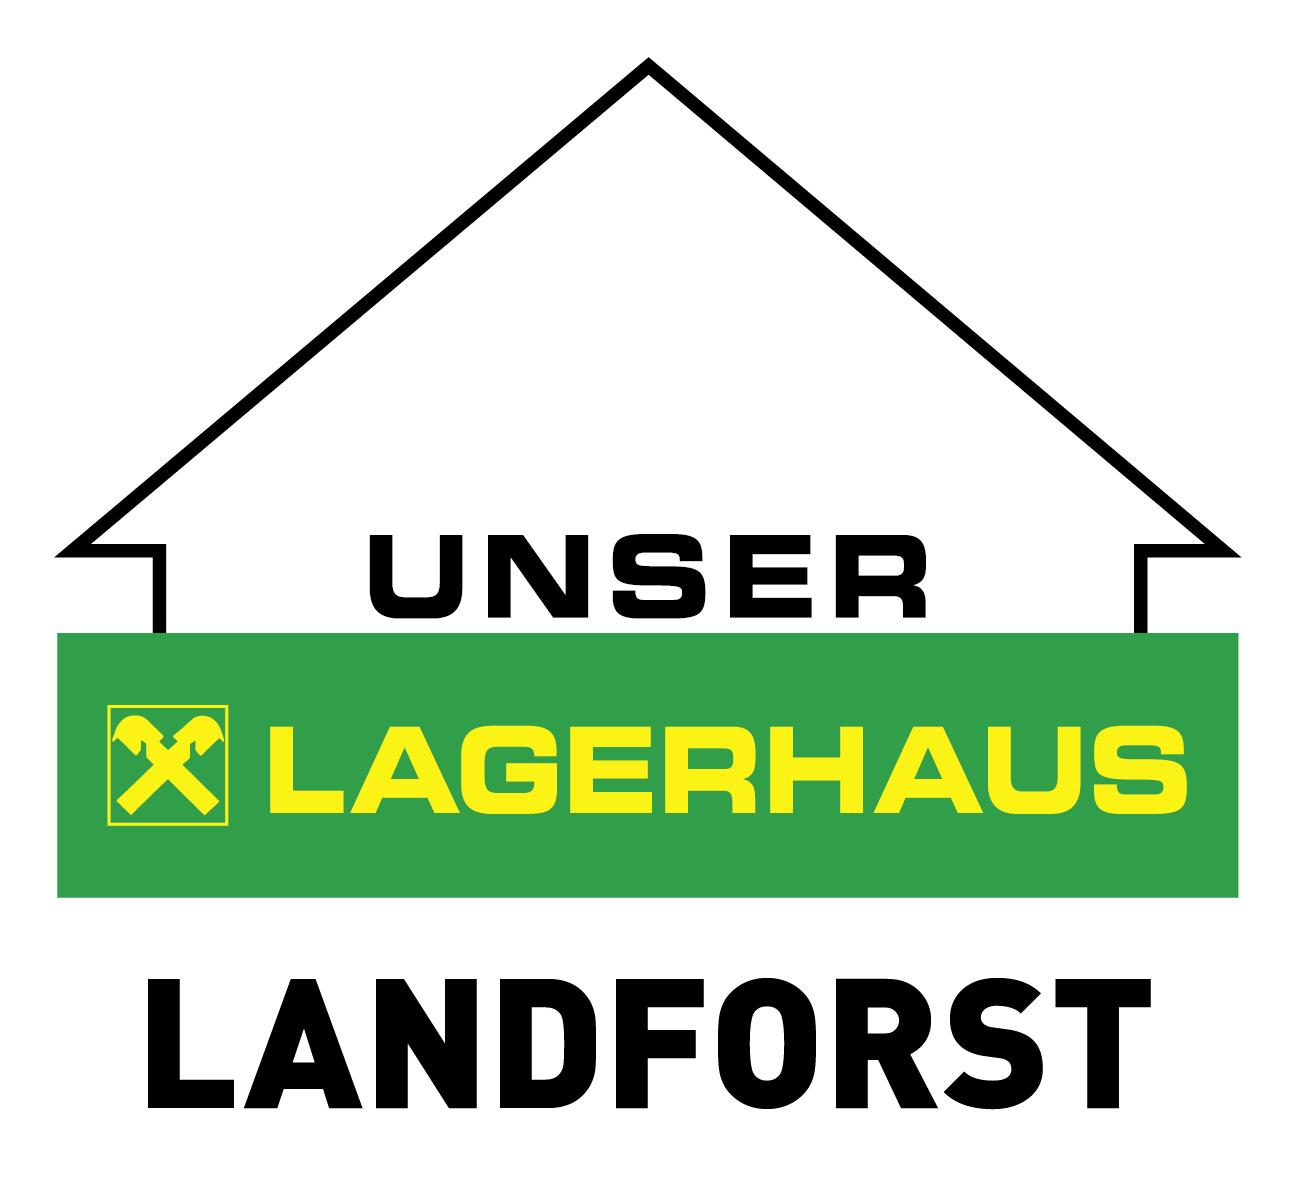 Landforst Lagerhaus & Co. KG